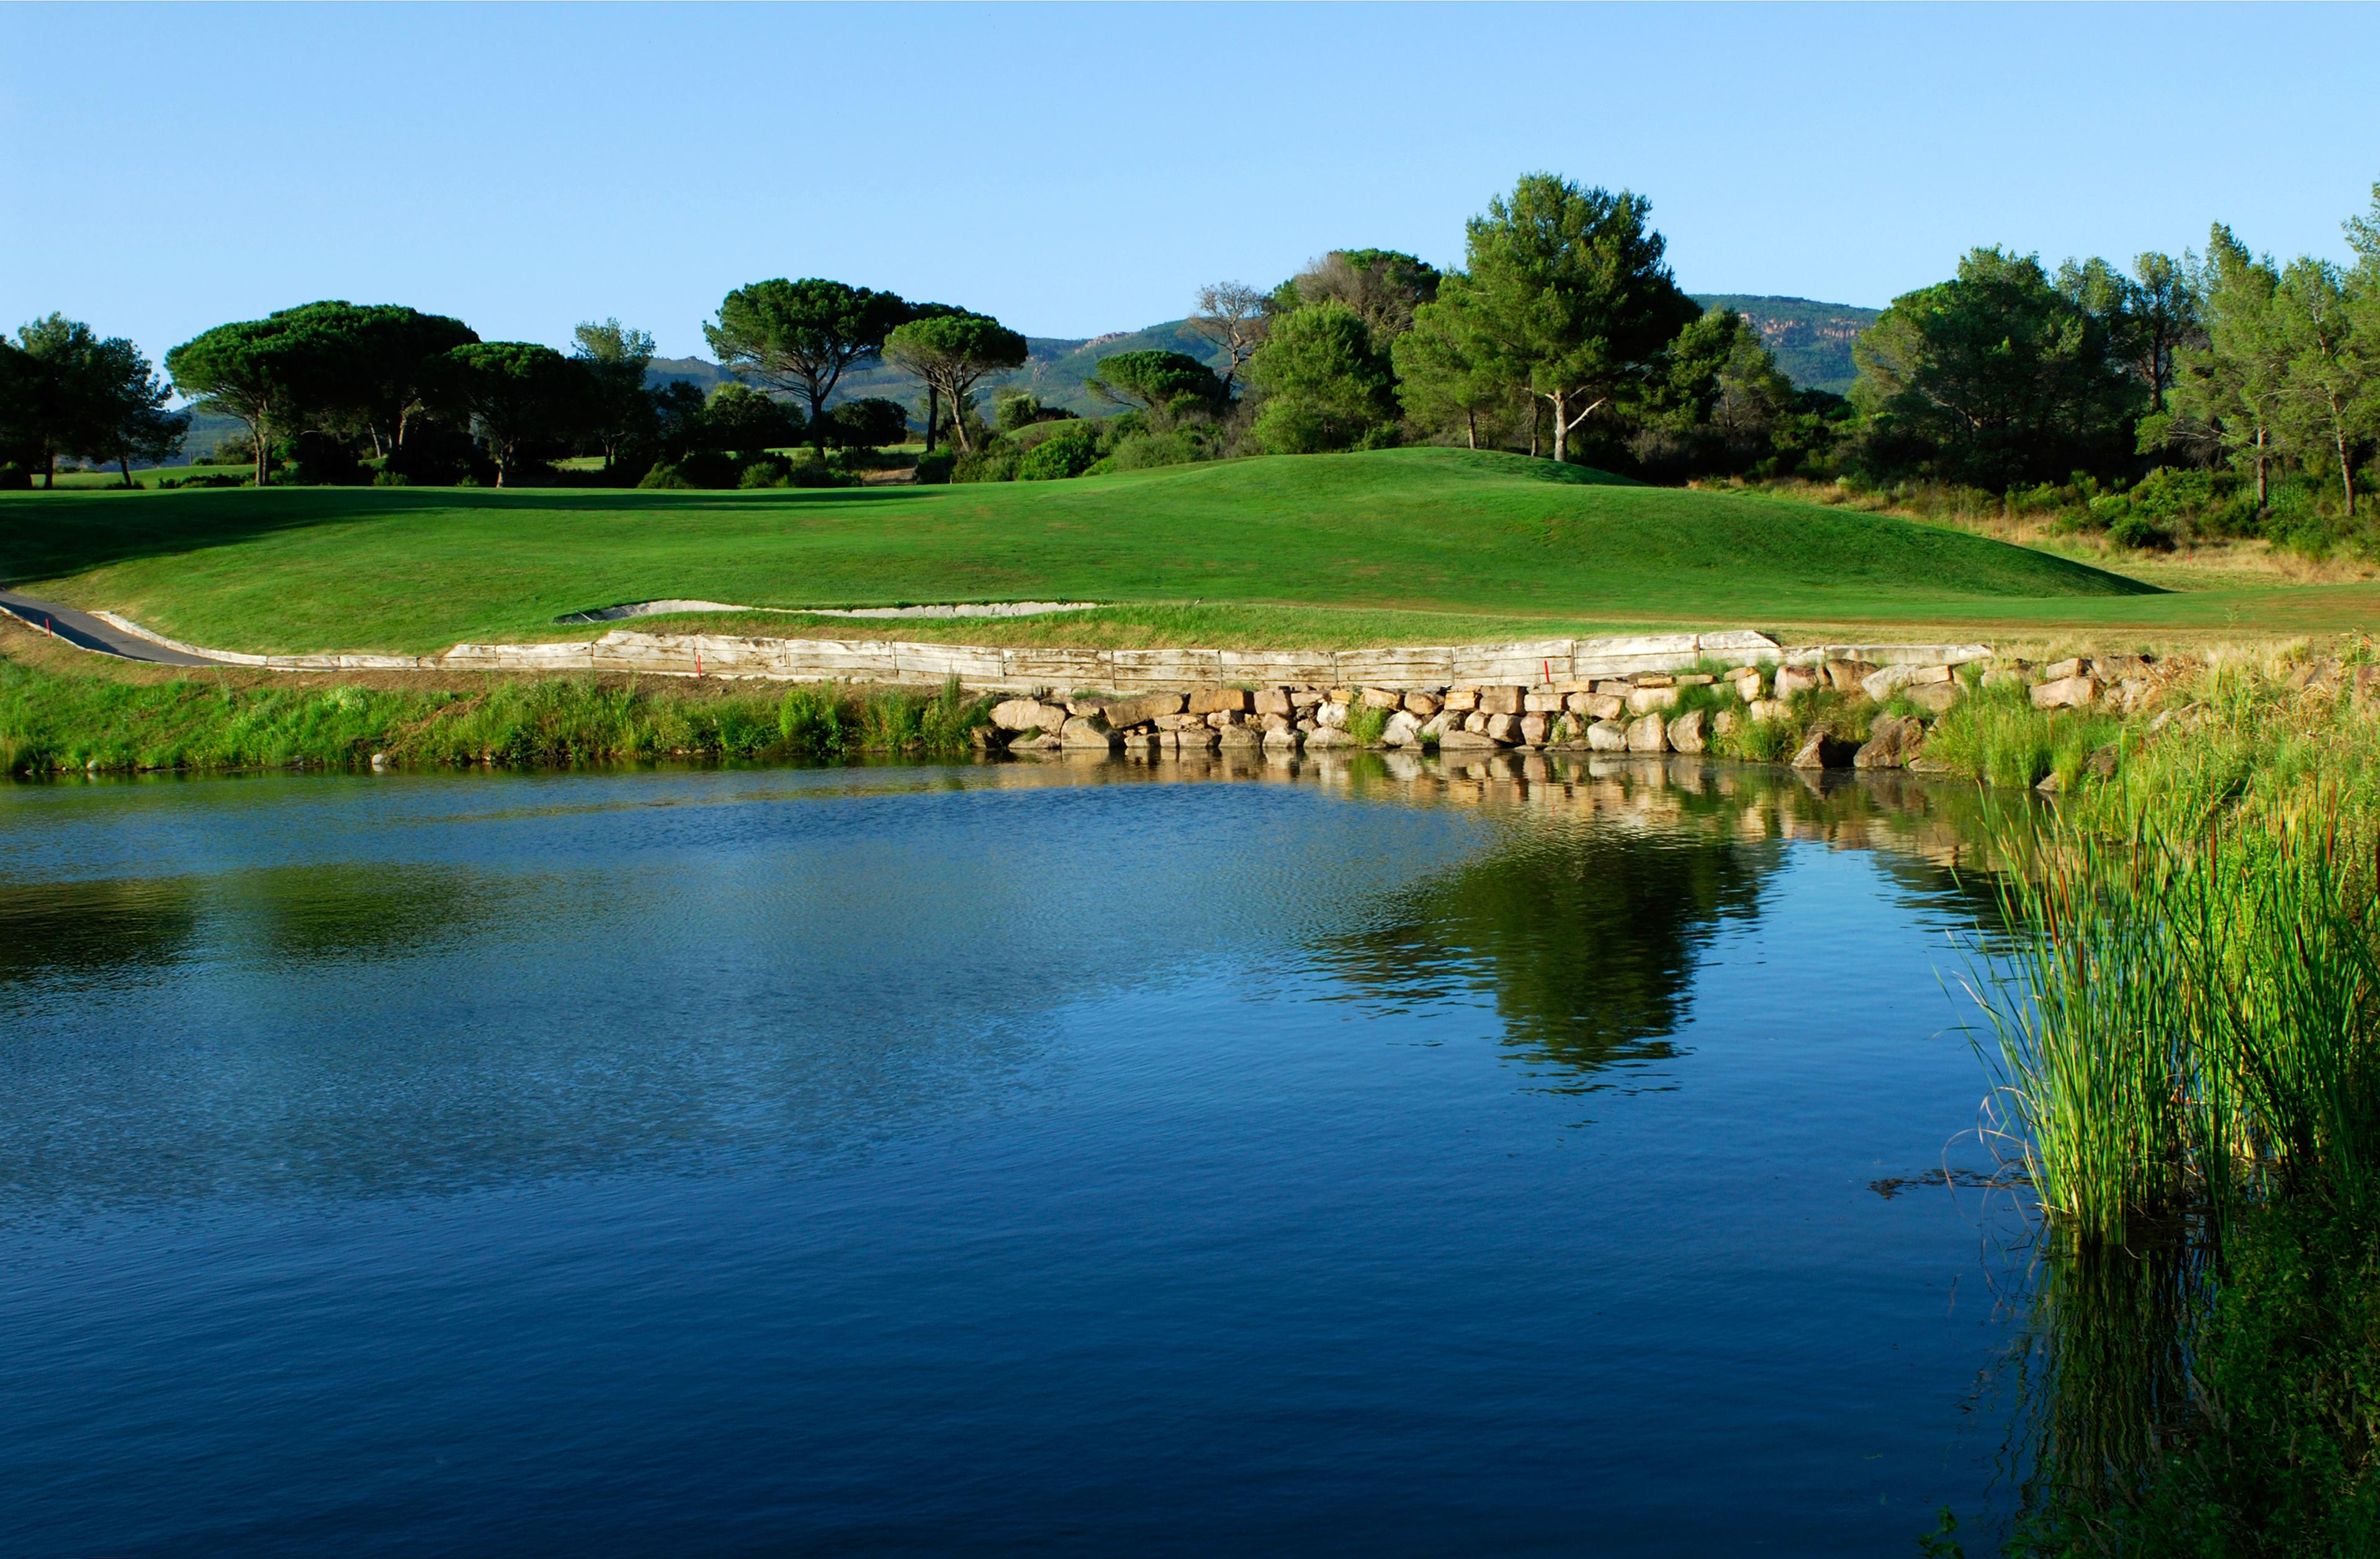 golf-expedition-golf-reizen-frankrijk-regio-cote-dazur-Les-Domaines-de-Saint-Endréol-Golf-en-Spa-Resort-water-hazard-golfbaan.jpg